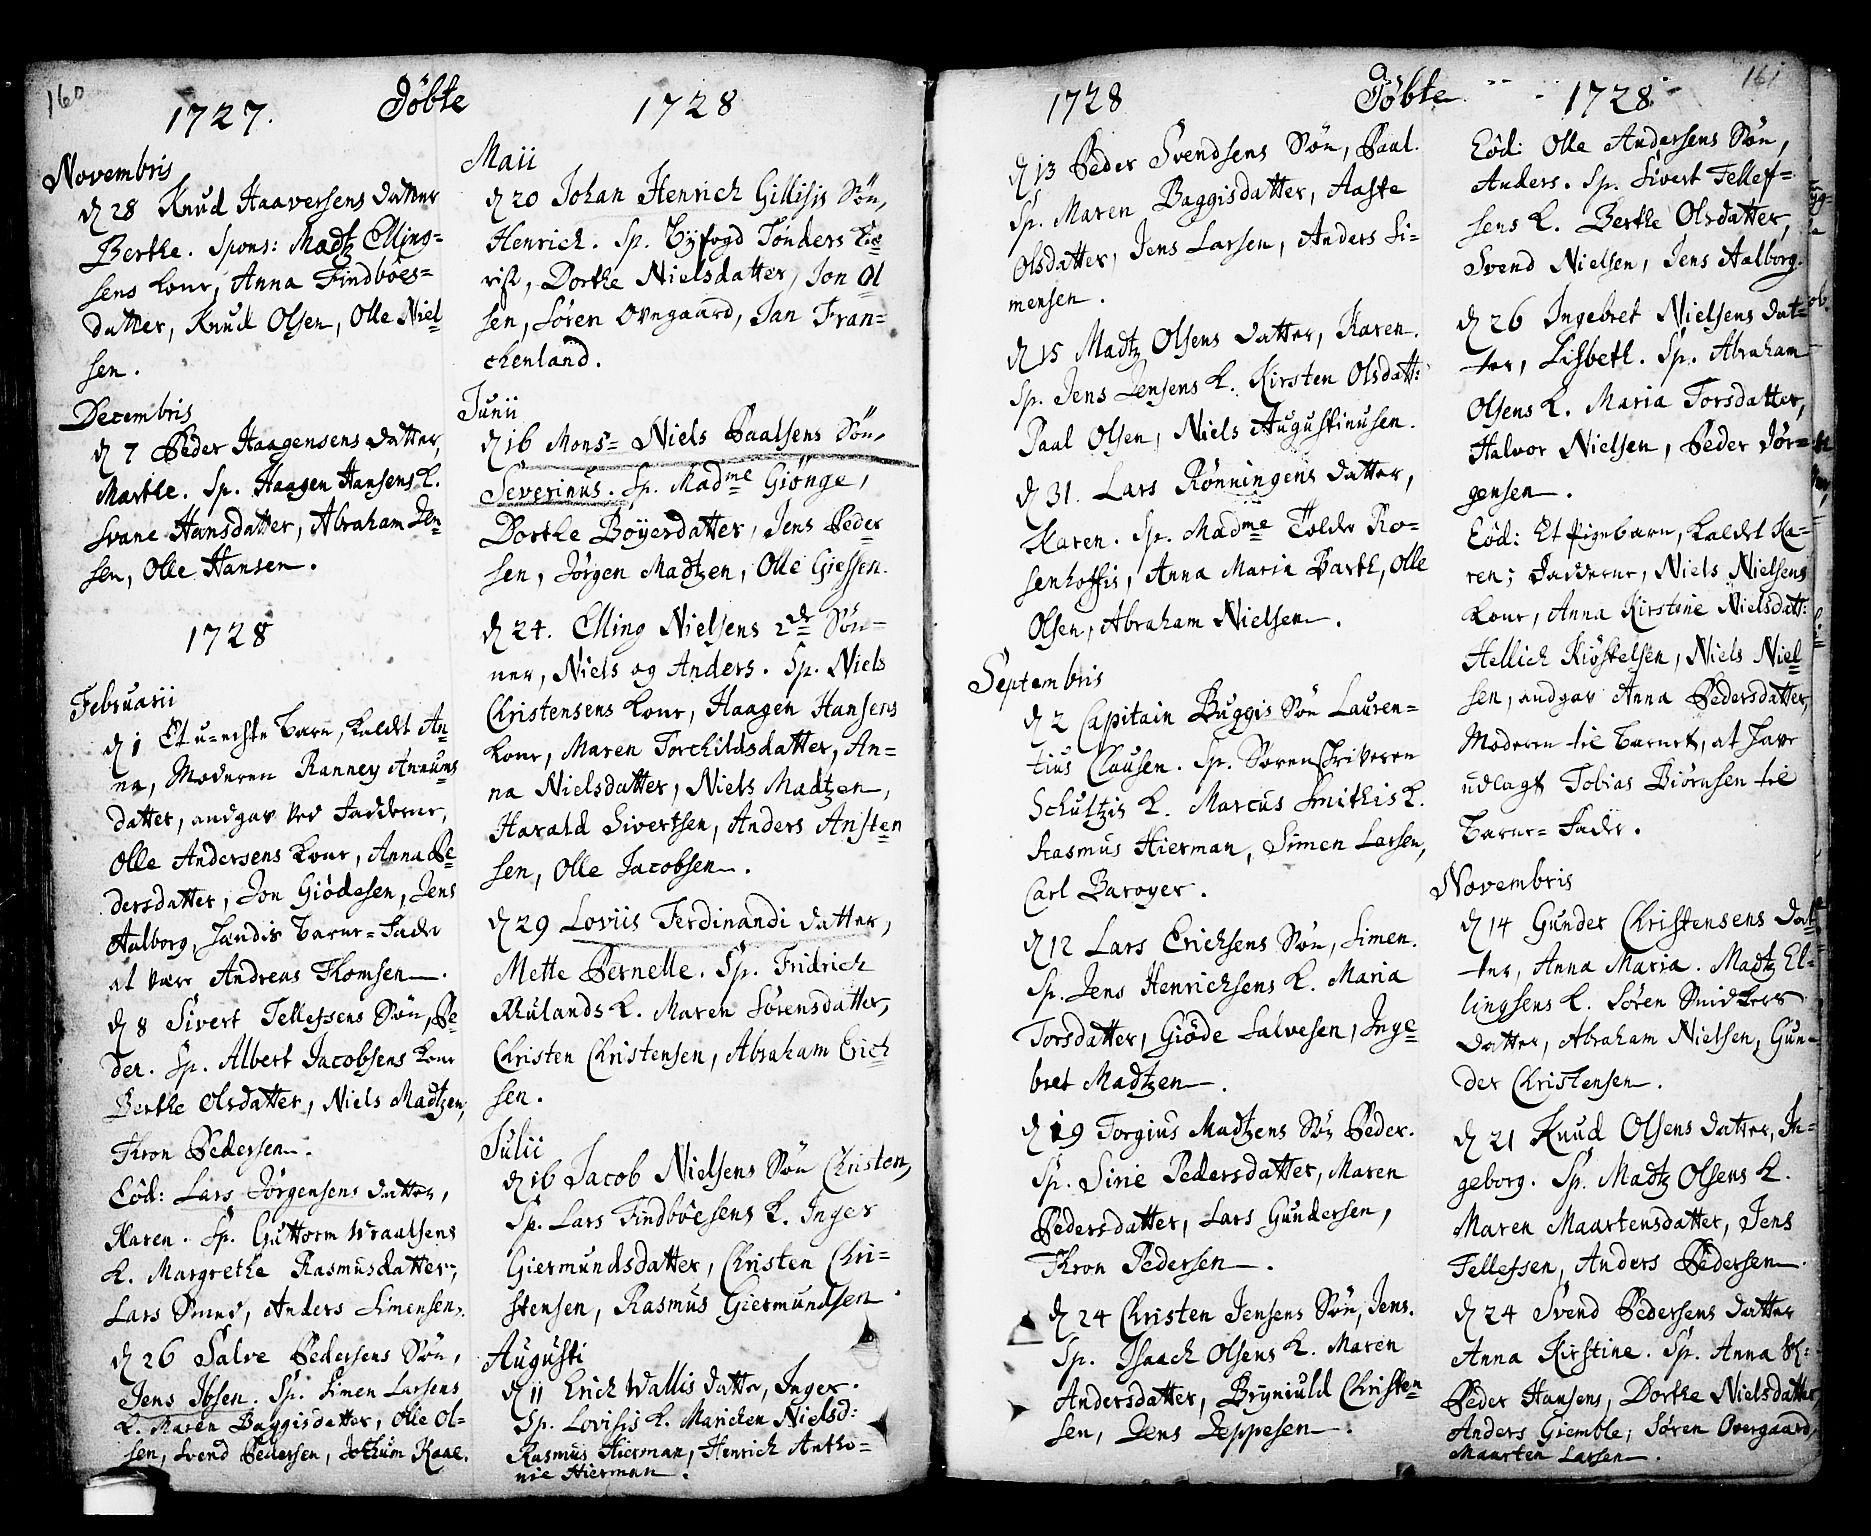 SAKO, Kragerø kirkebøker, F/Fa/L0001: Ministerialbok nr. 1, 1702-1766, s. 160-161